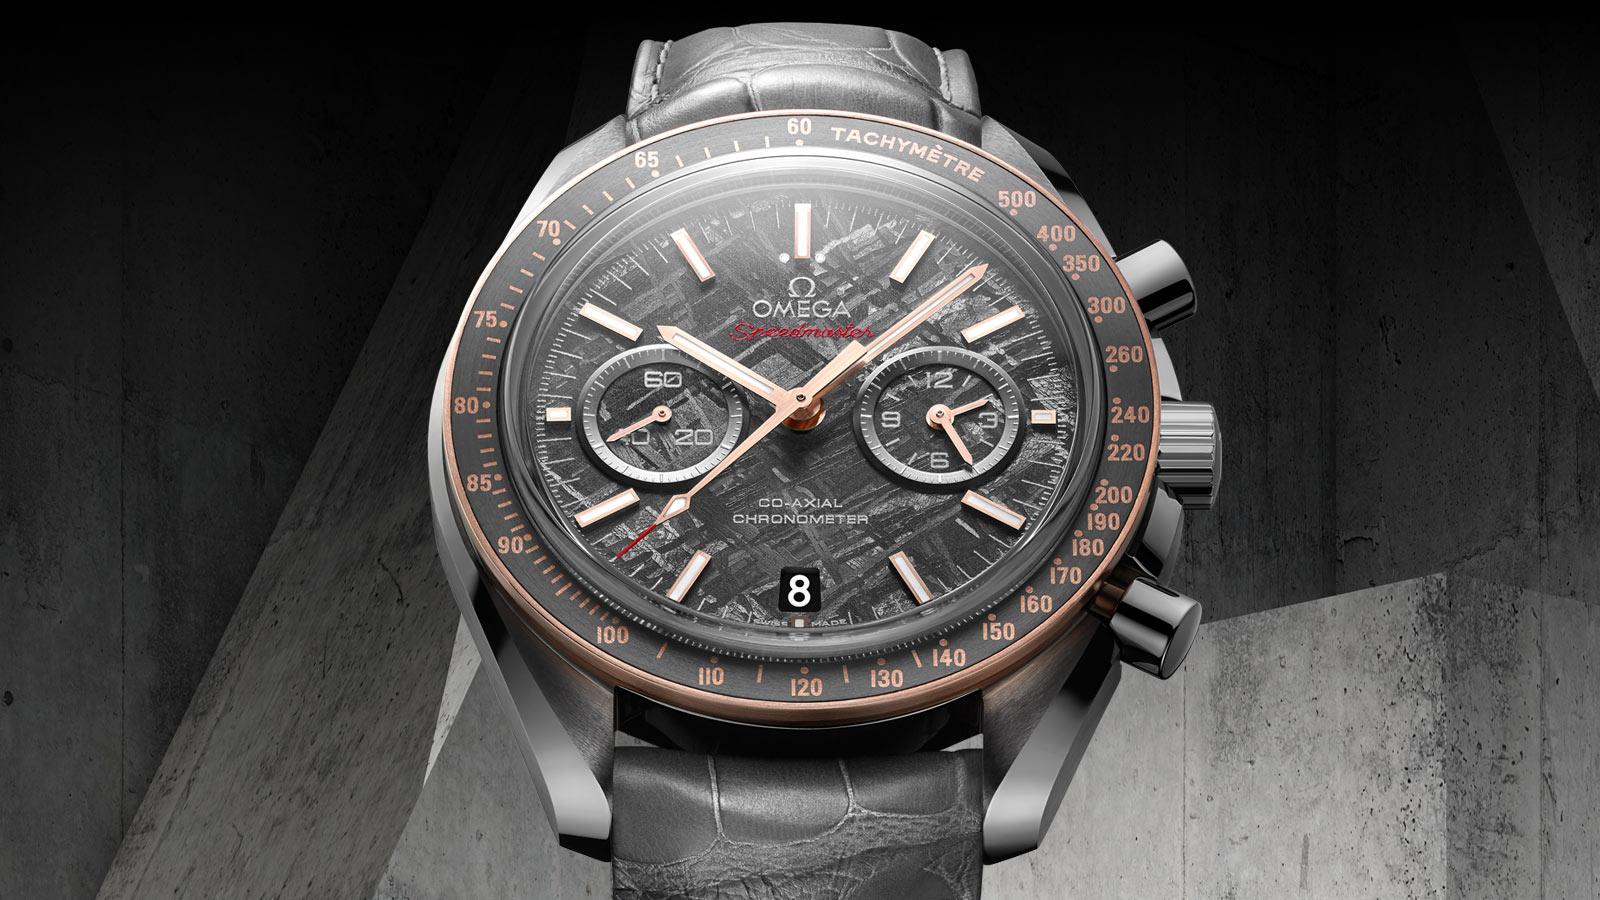 Omega replica watches Speedmaster watch